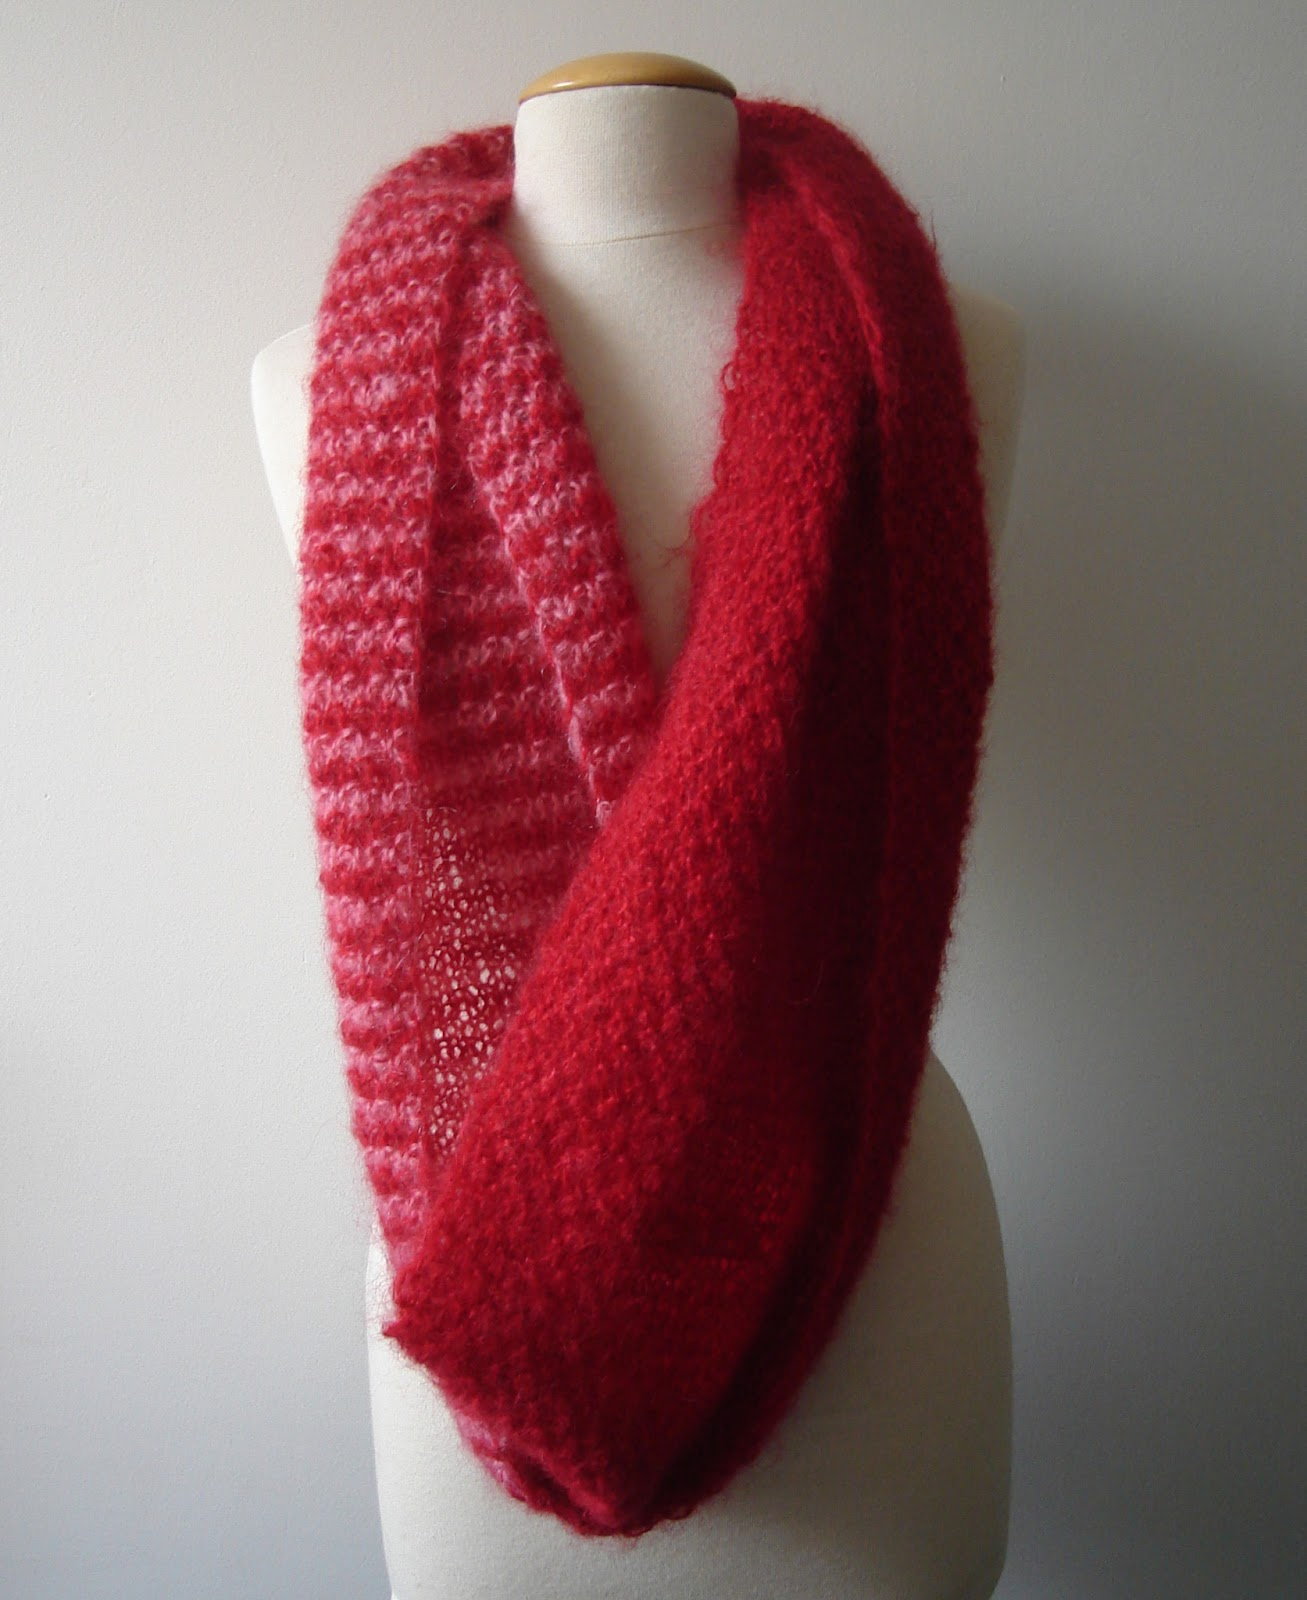 HandmadeHandsome, handmade items and knitting patterns ...